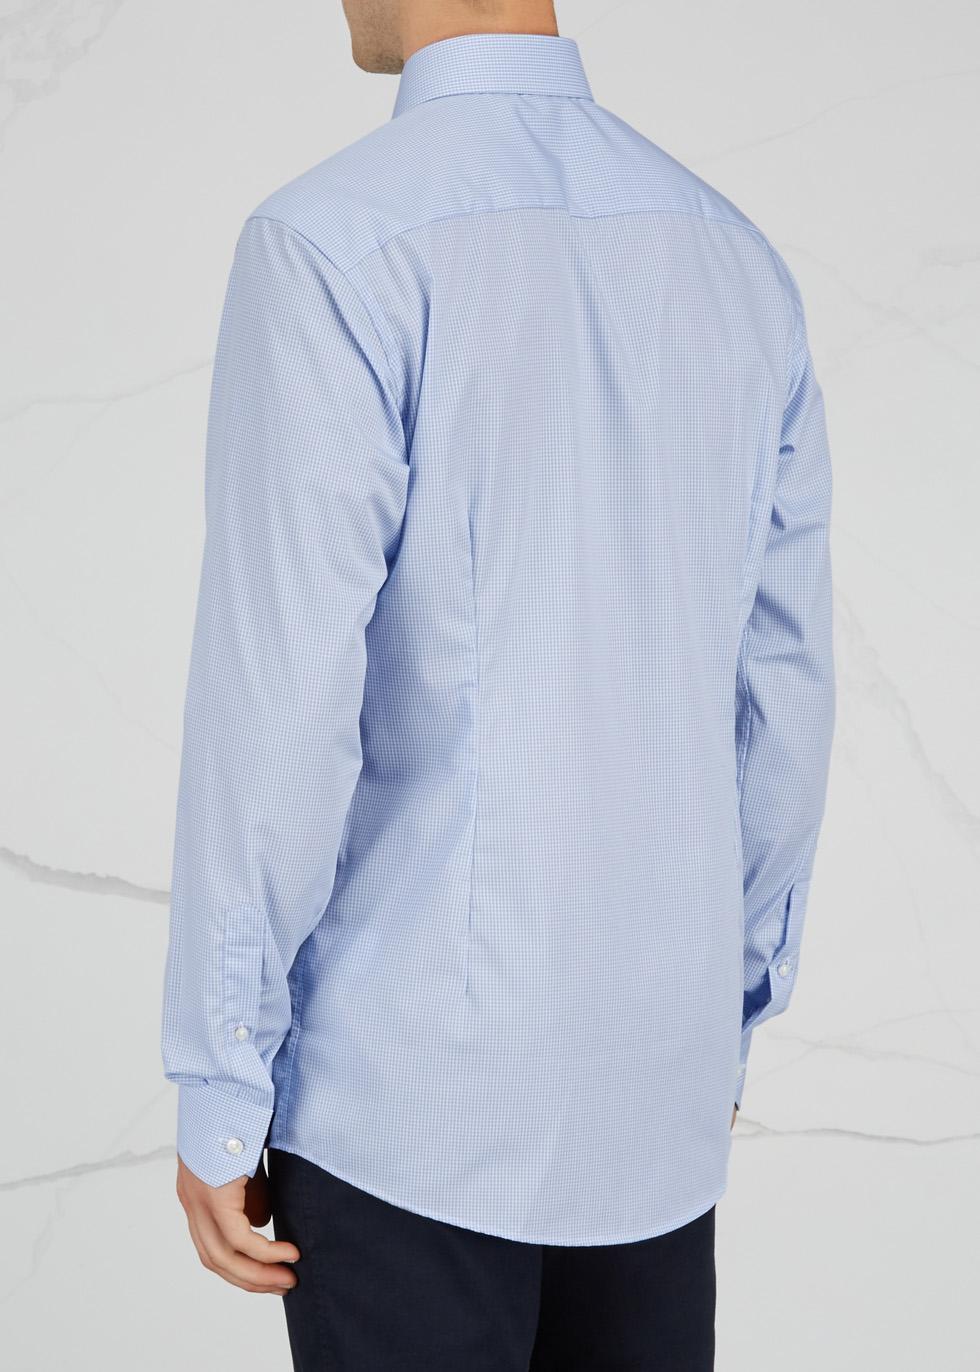 Blue slim gingham cotton shirt - Eton